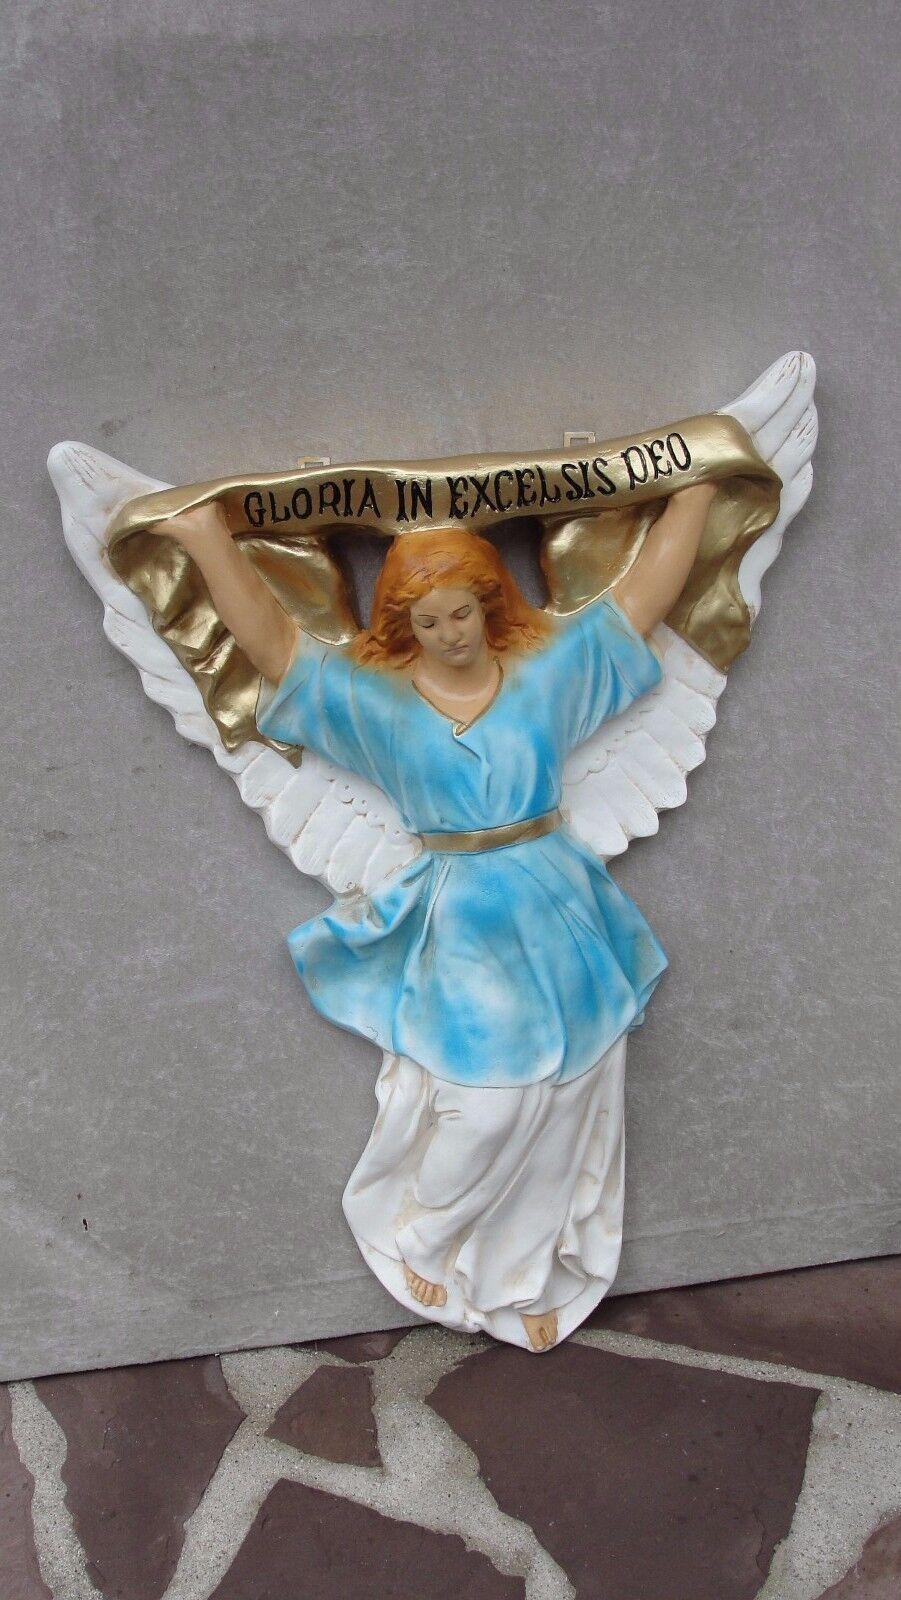 Gloria in Excelsis Figur Engel Krippenfigur Weihnachten Krippe Skulptur Relief